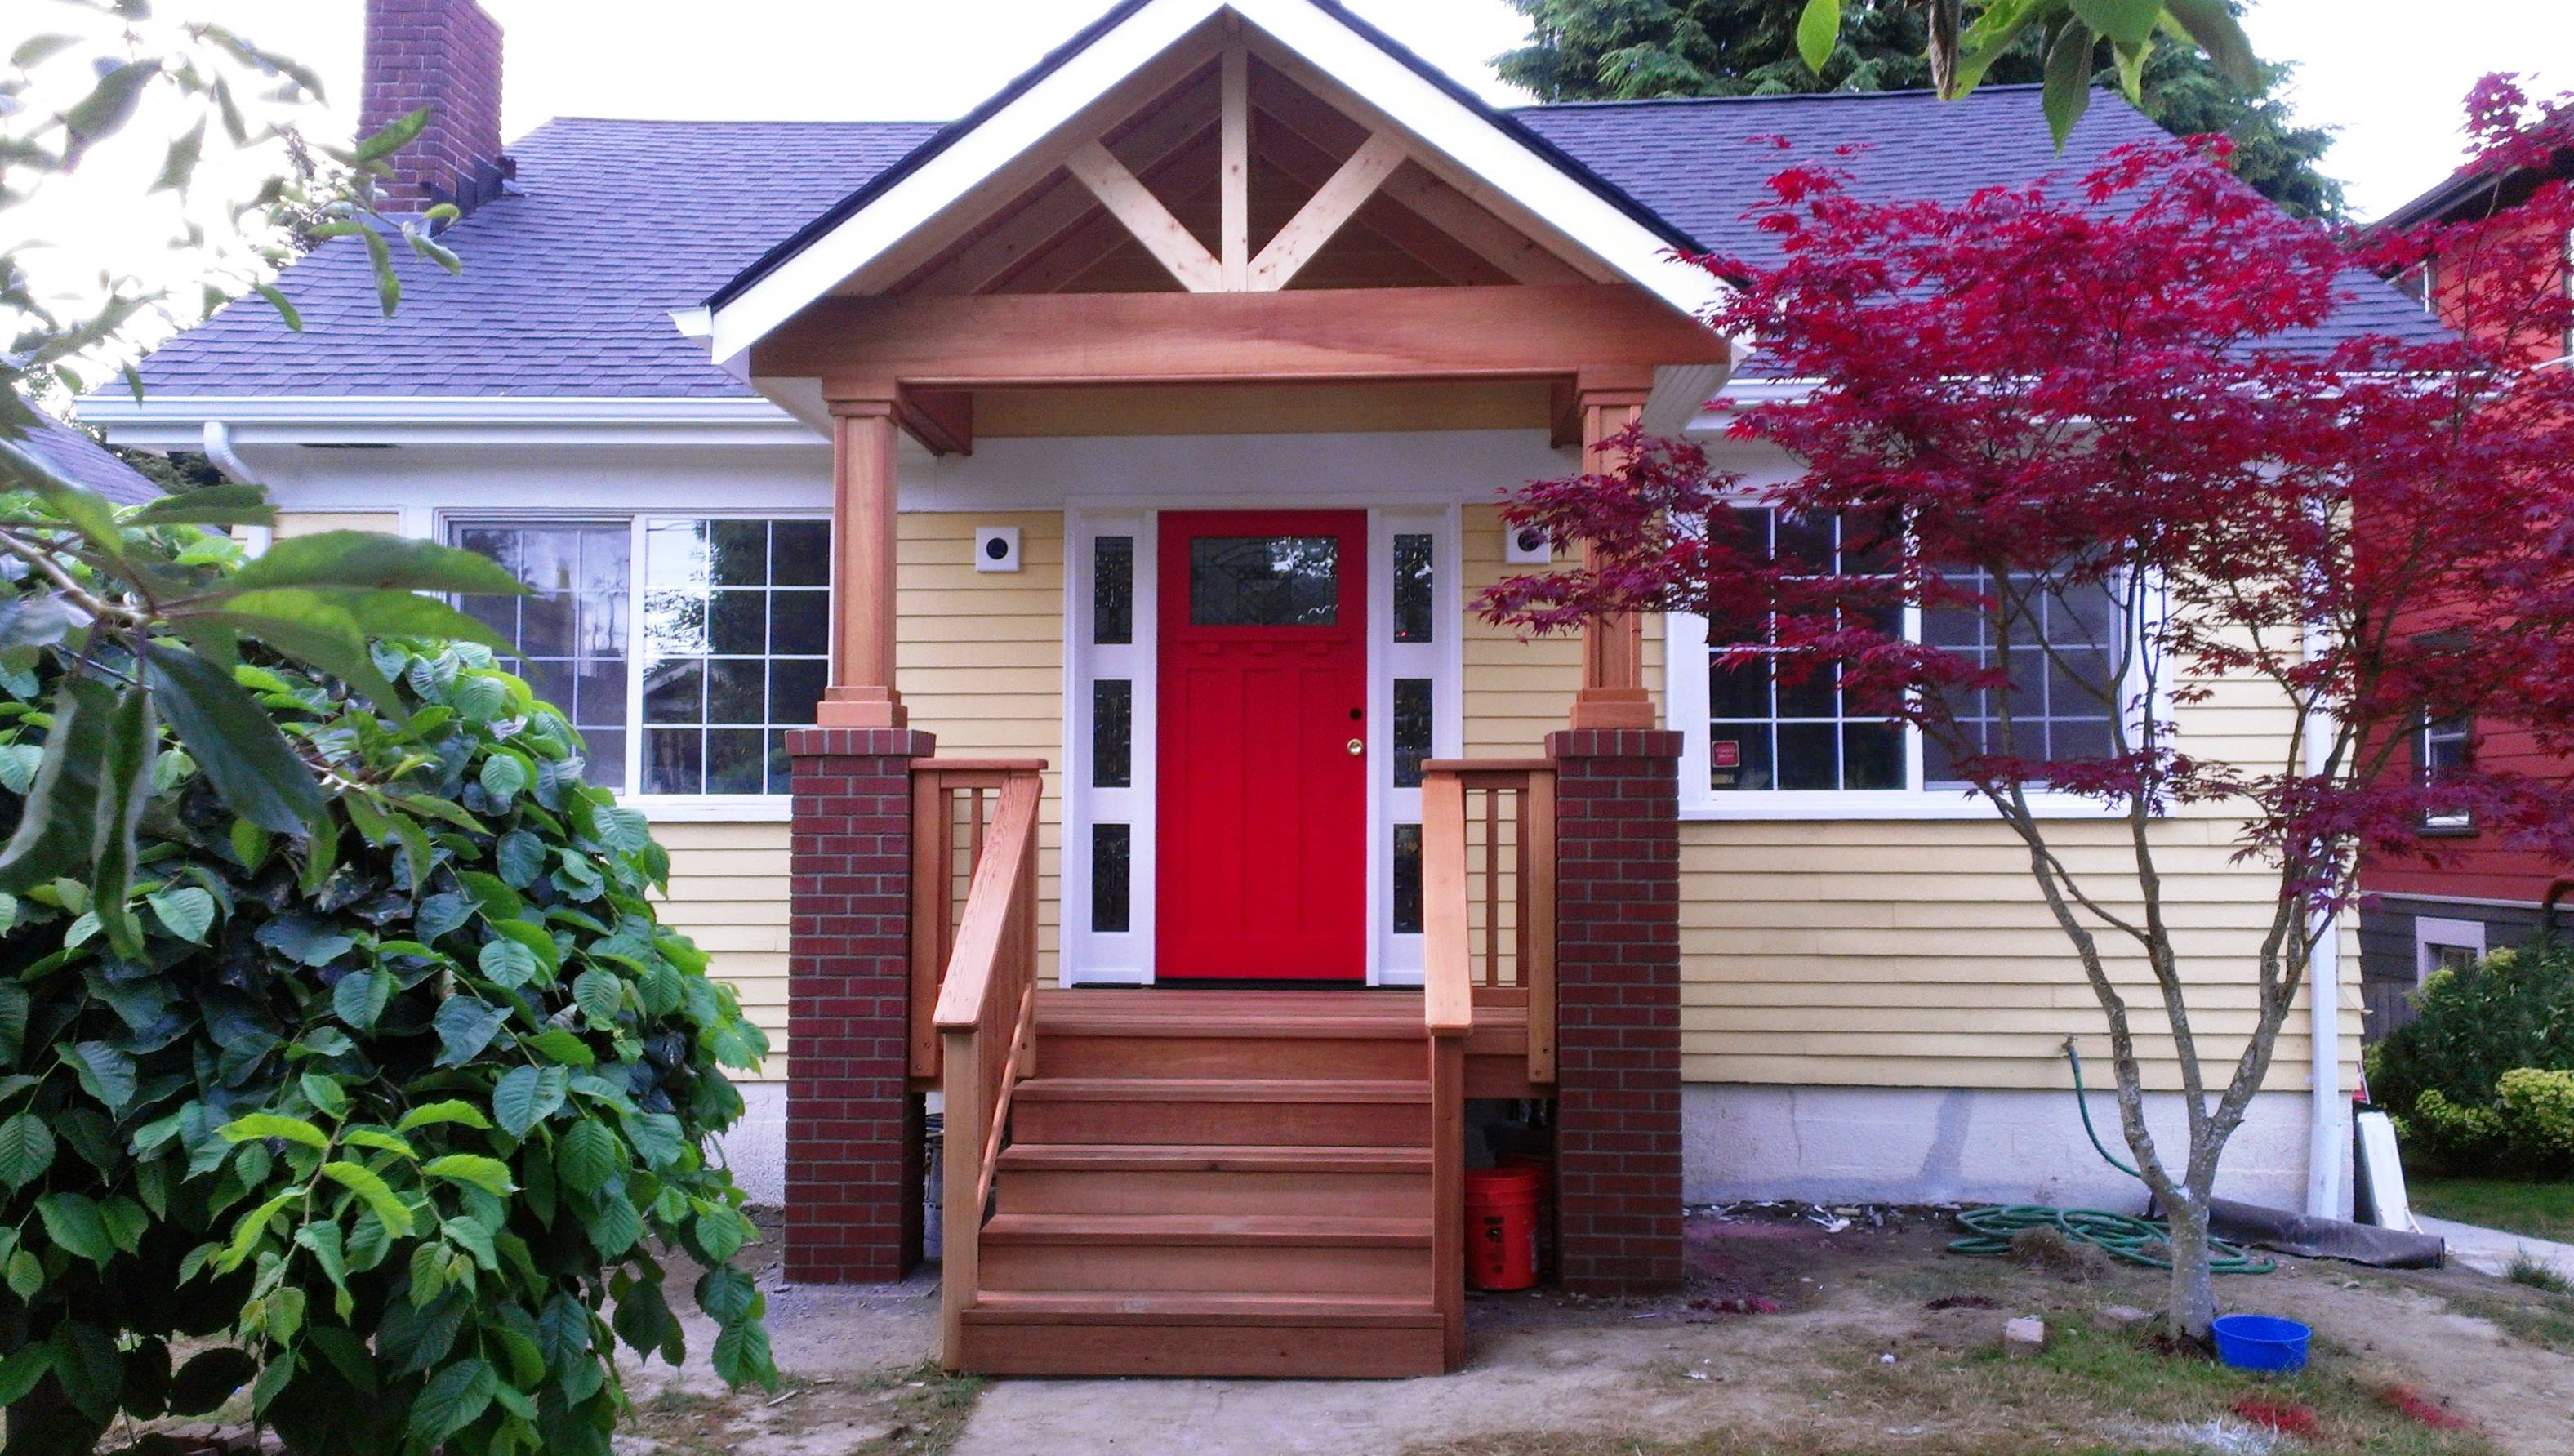 adding front porch to brick house decoto adding porch brick house home design ideas